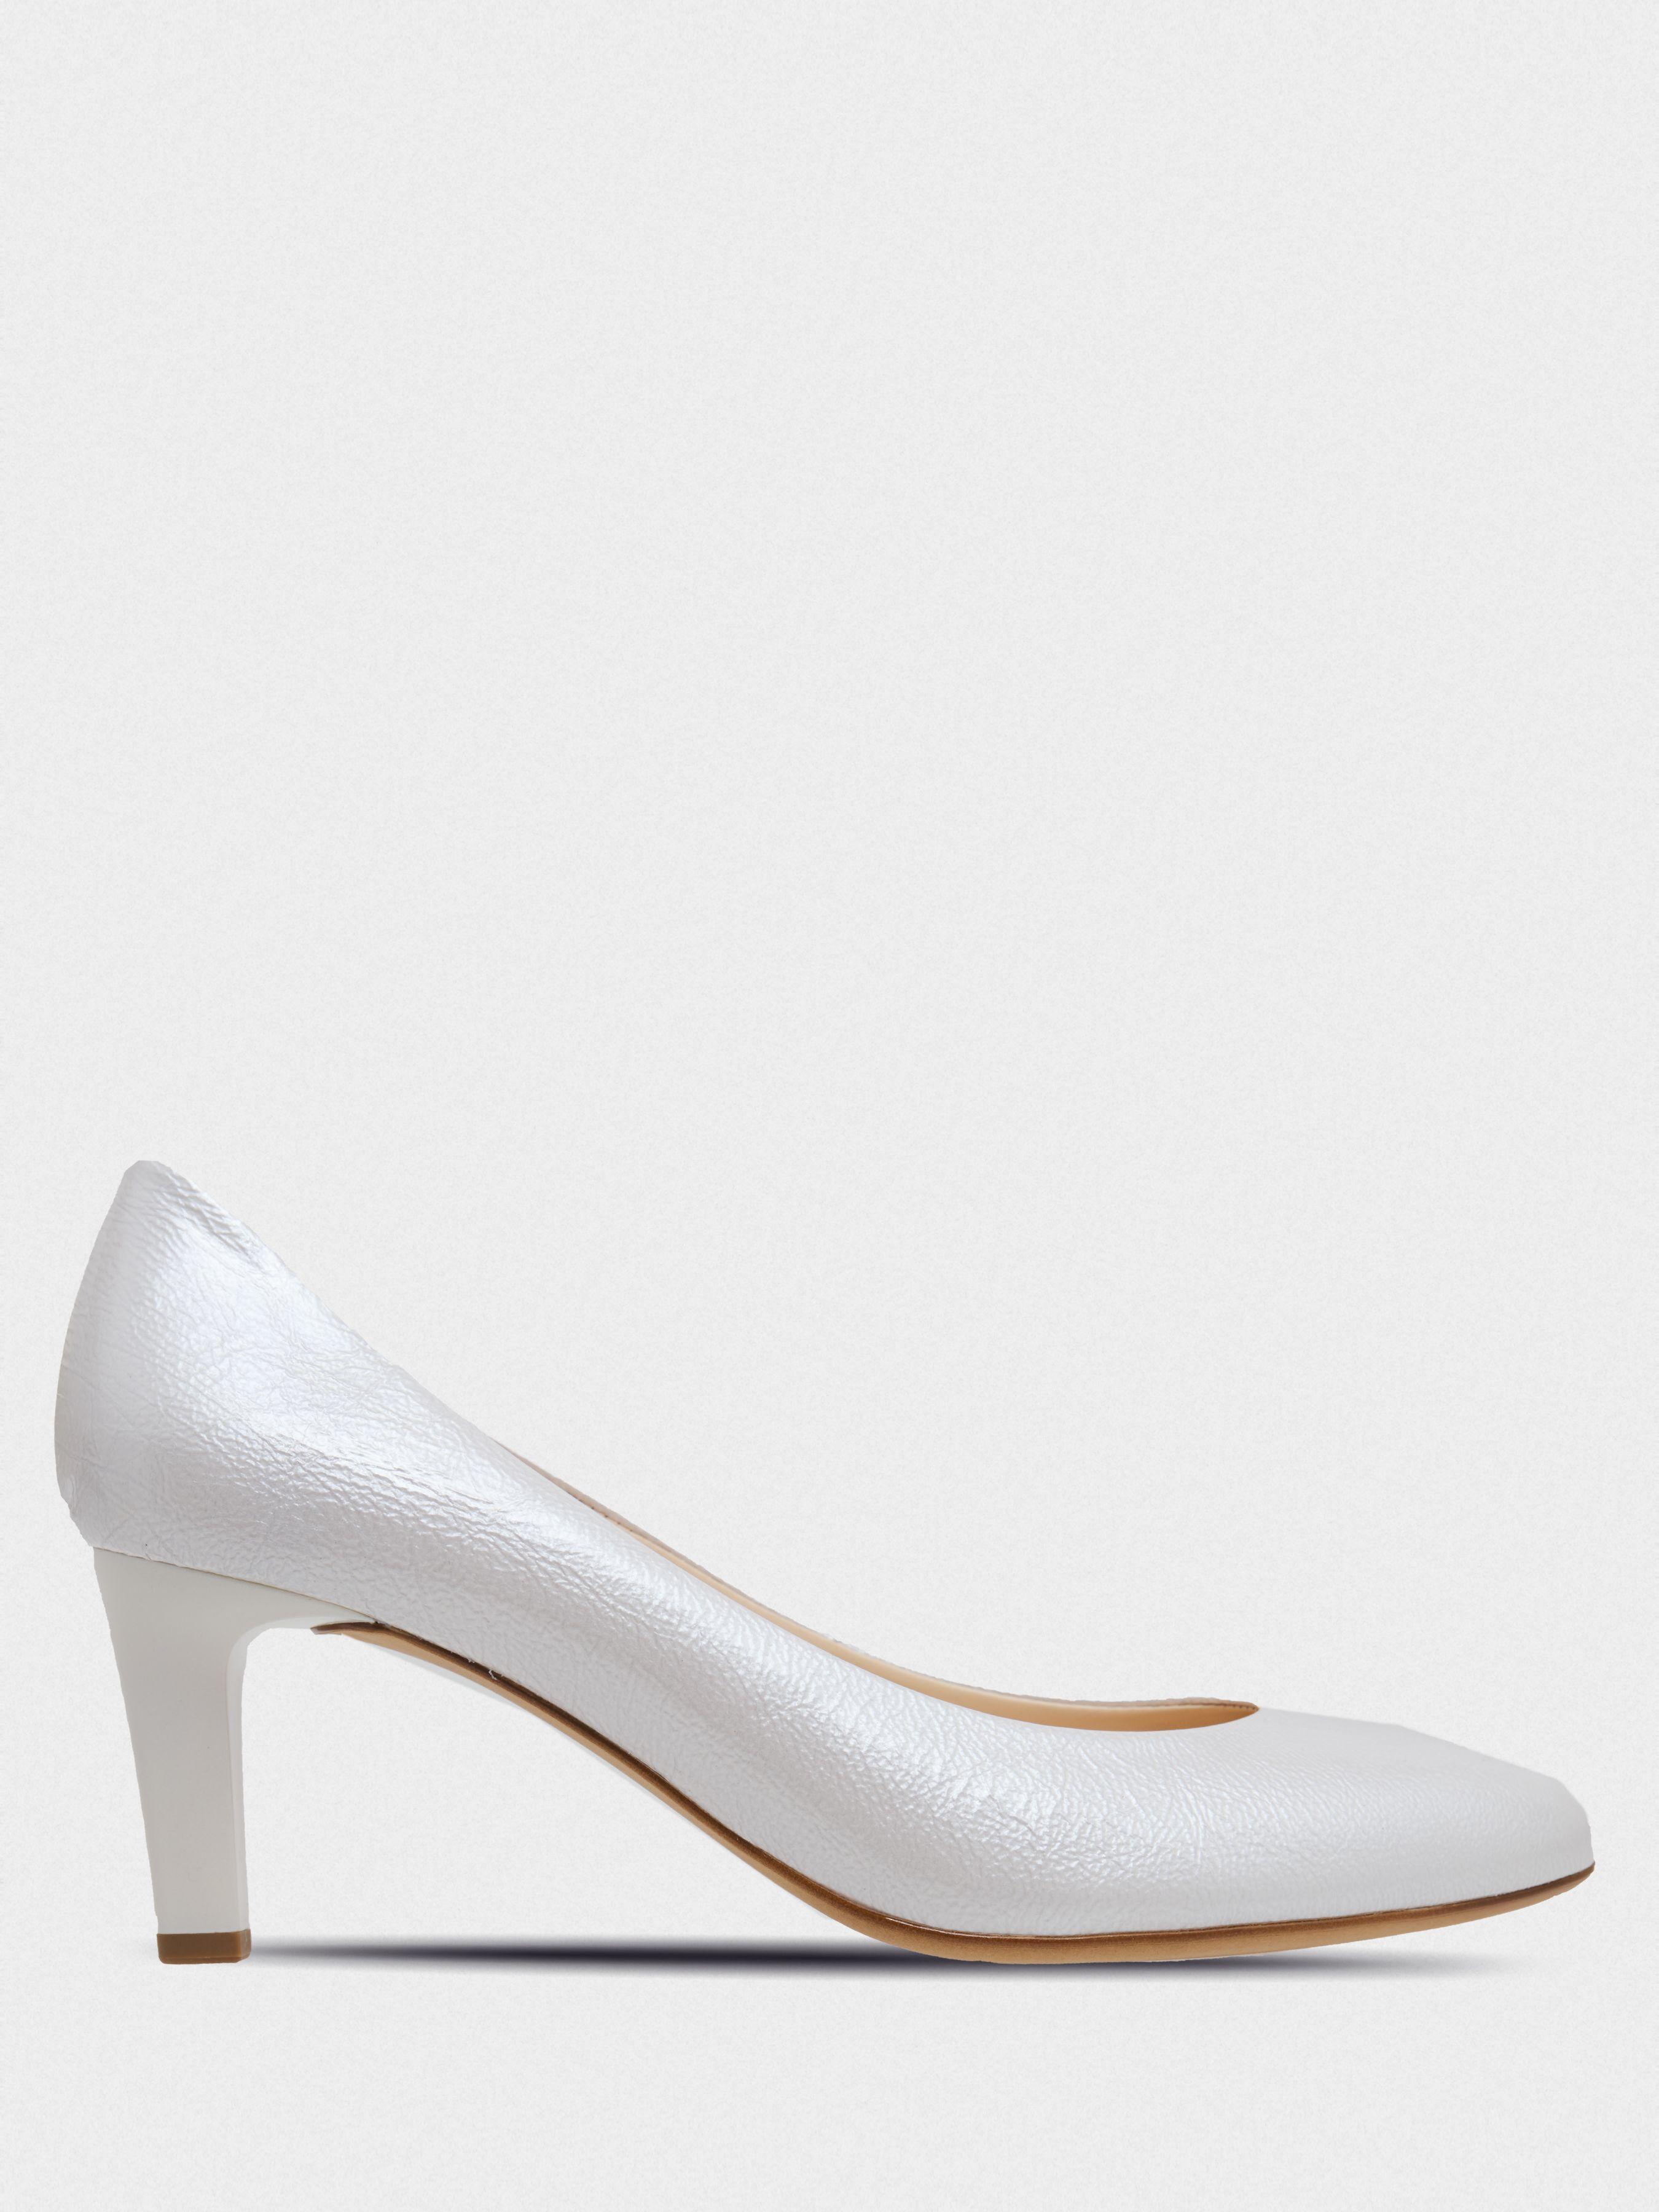 Купить Туфли женские Hogl STARLIGHT YN4022, Серый